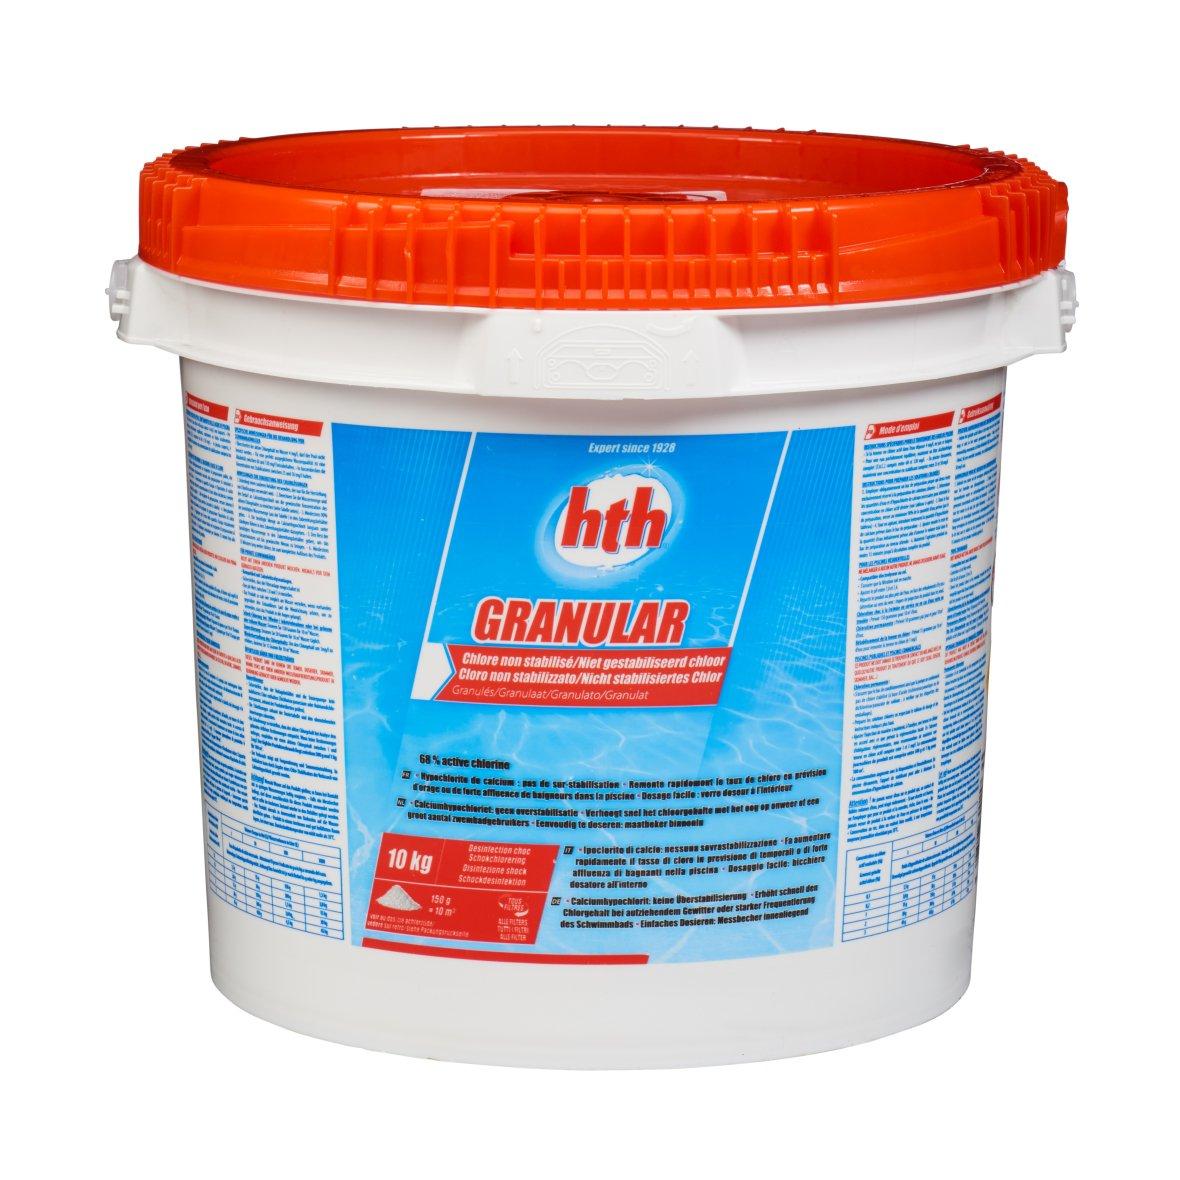 HTH granular 10 kg